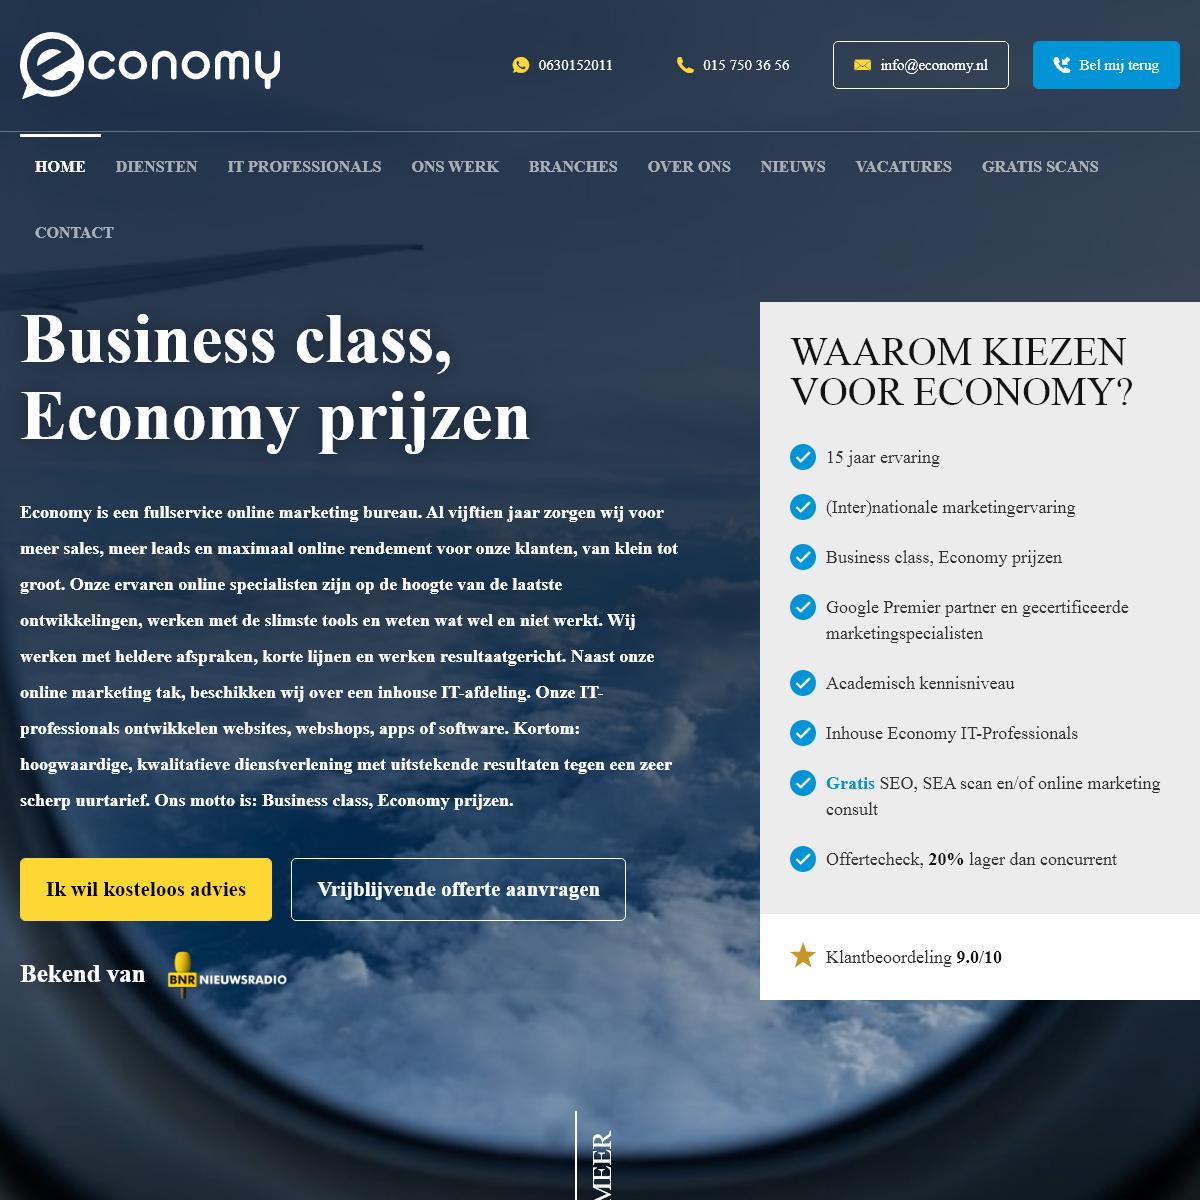 Economy Online Marketing & IT Specialisten - Business Class, Economy Prijzen